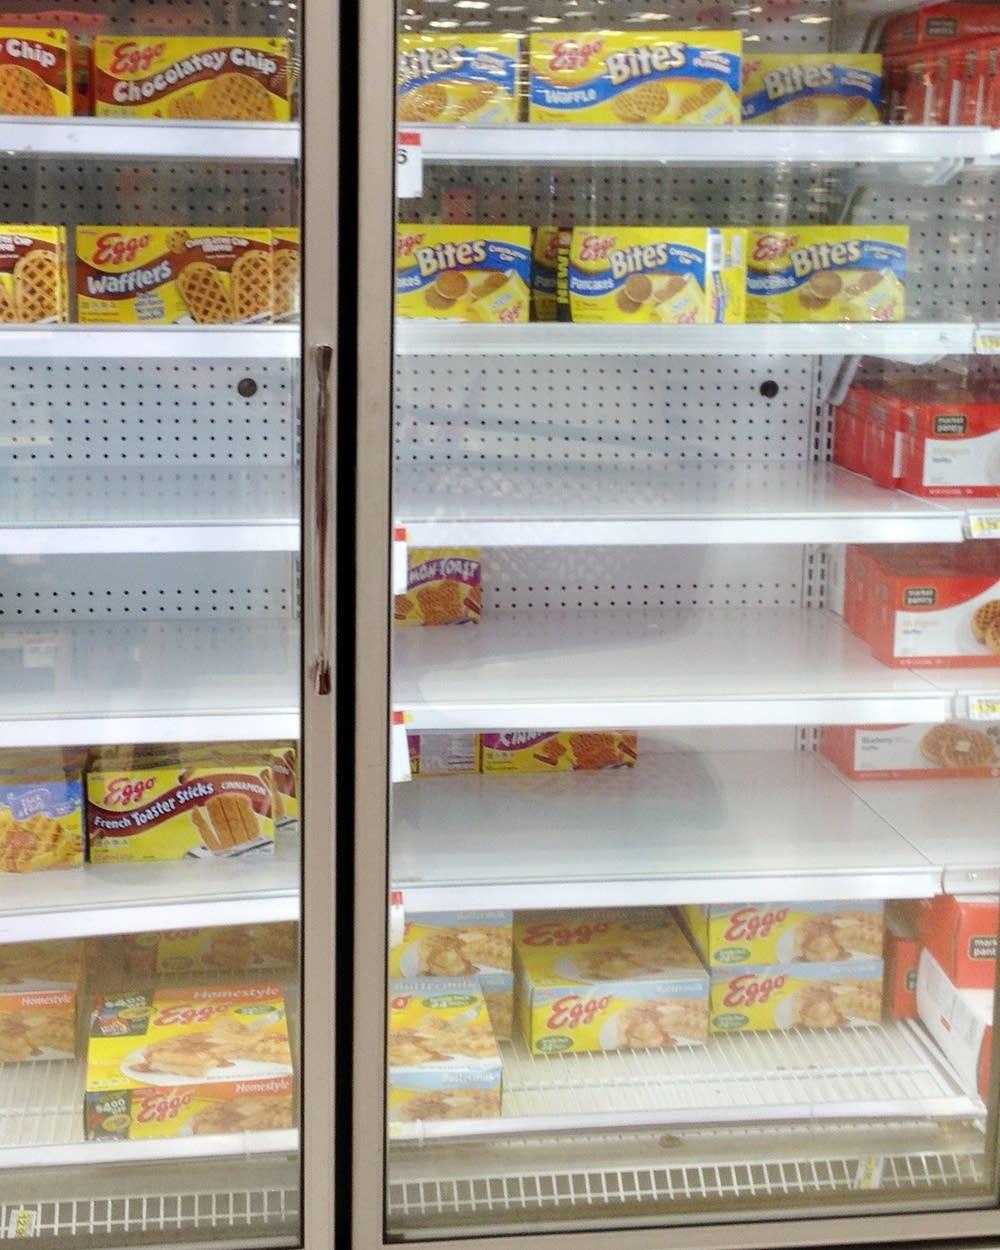 Superb Expect More Empty Shelves Frustrate Target Customers Execs Interior Design Ideas Gentotryabchikinfo